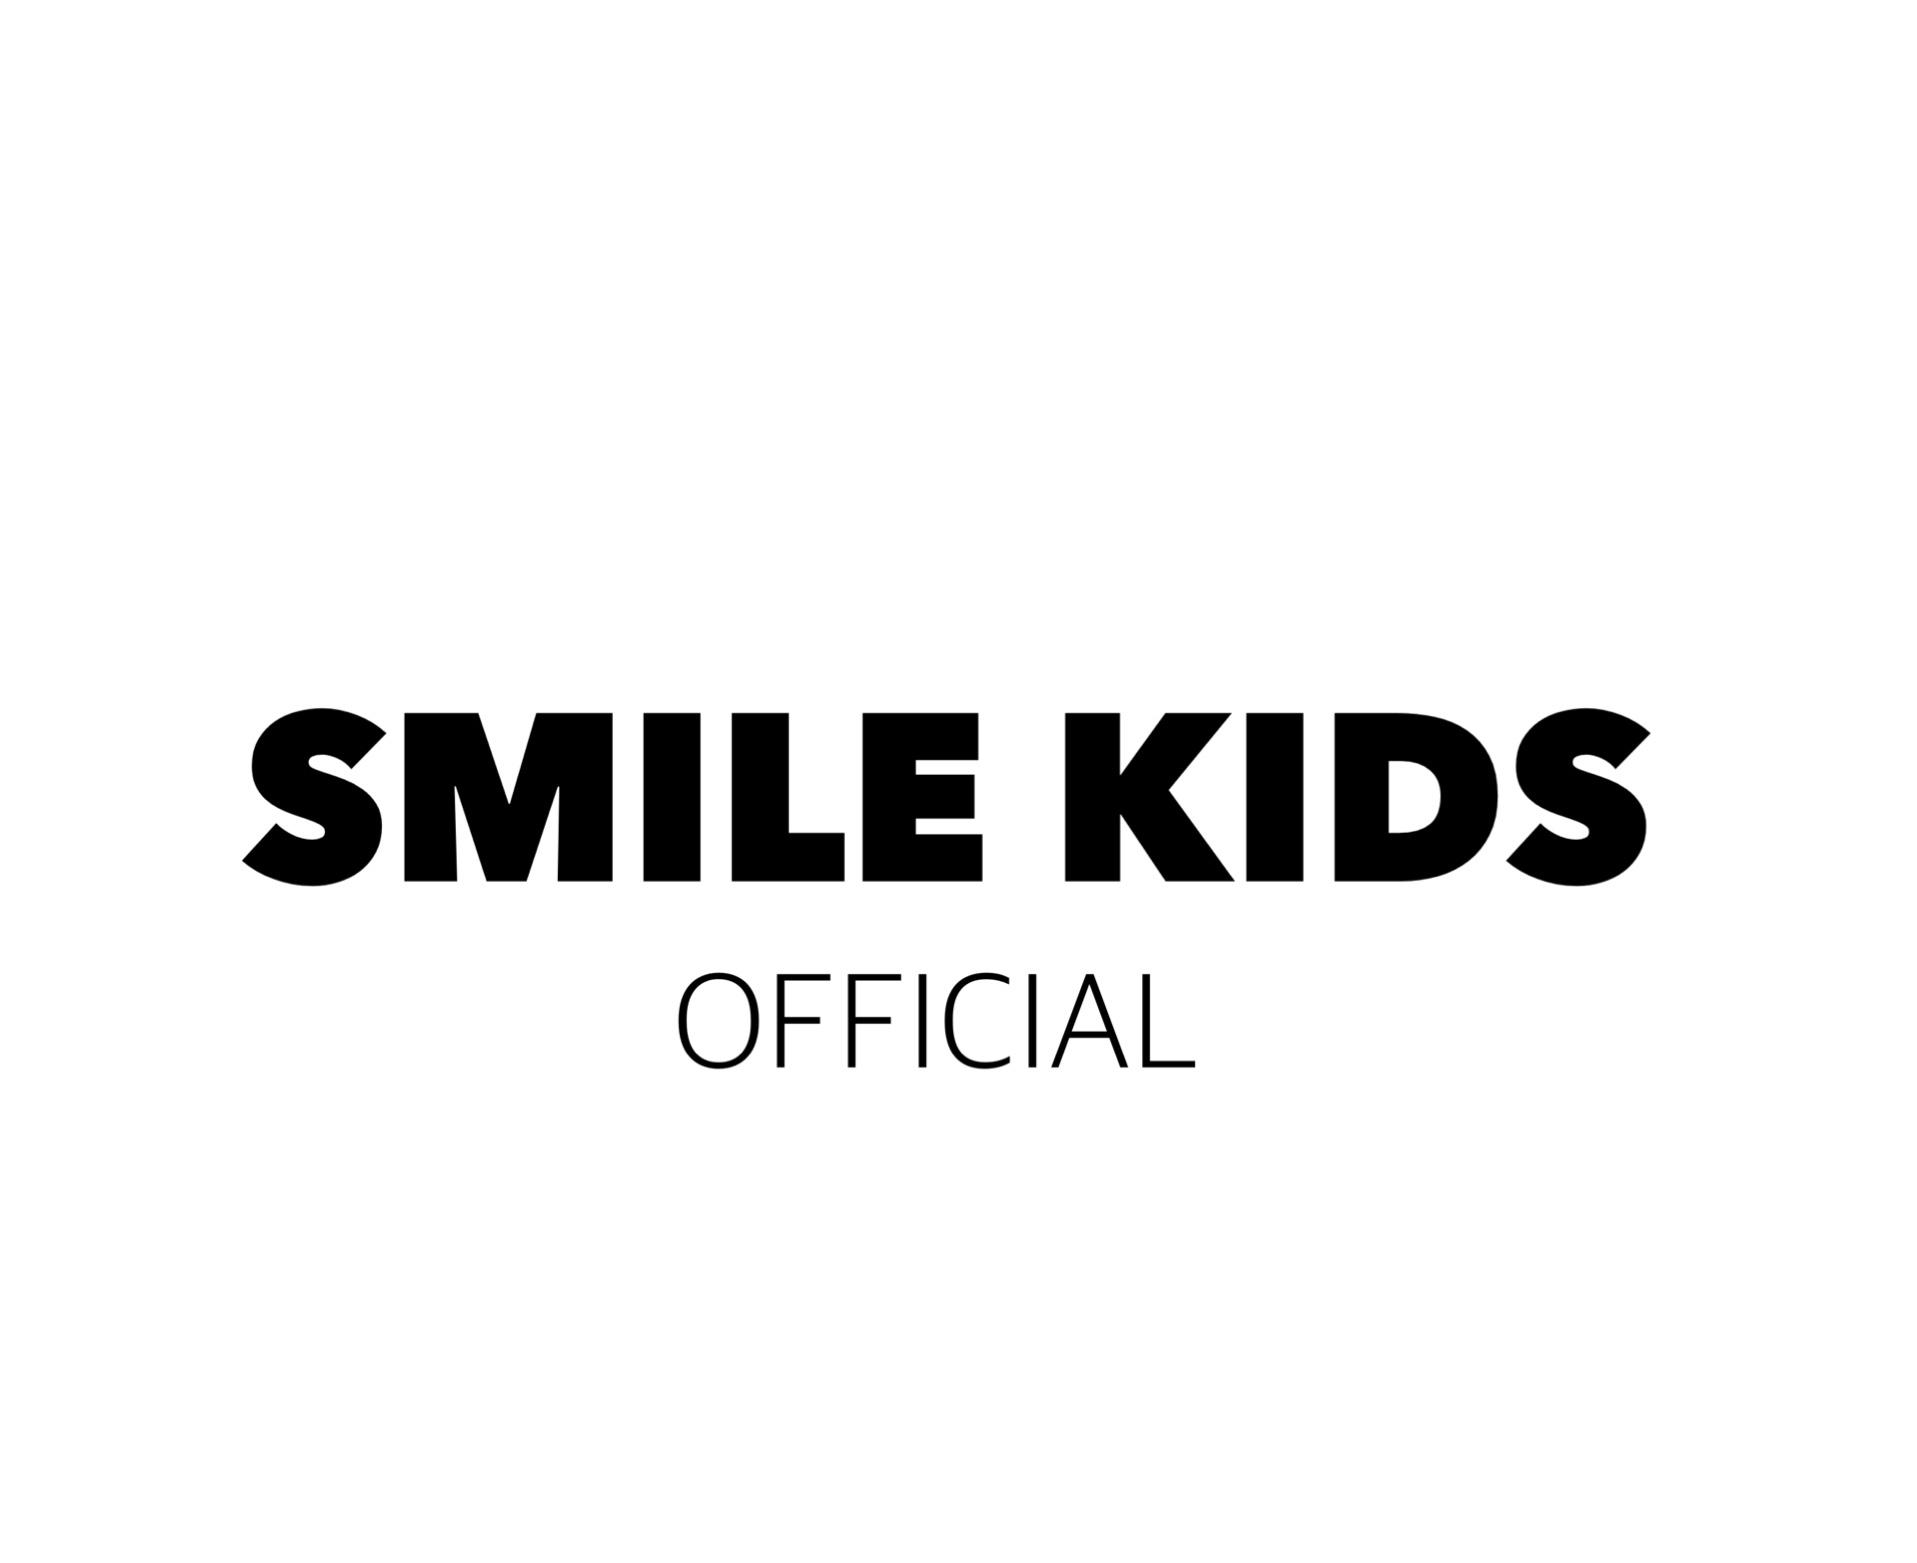 SmileKidsOfficial